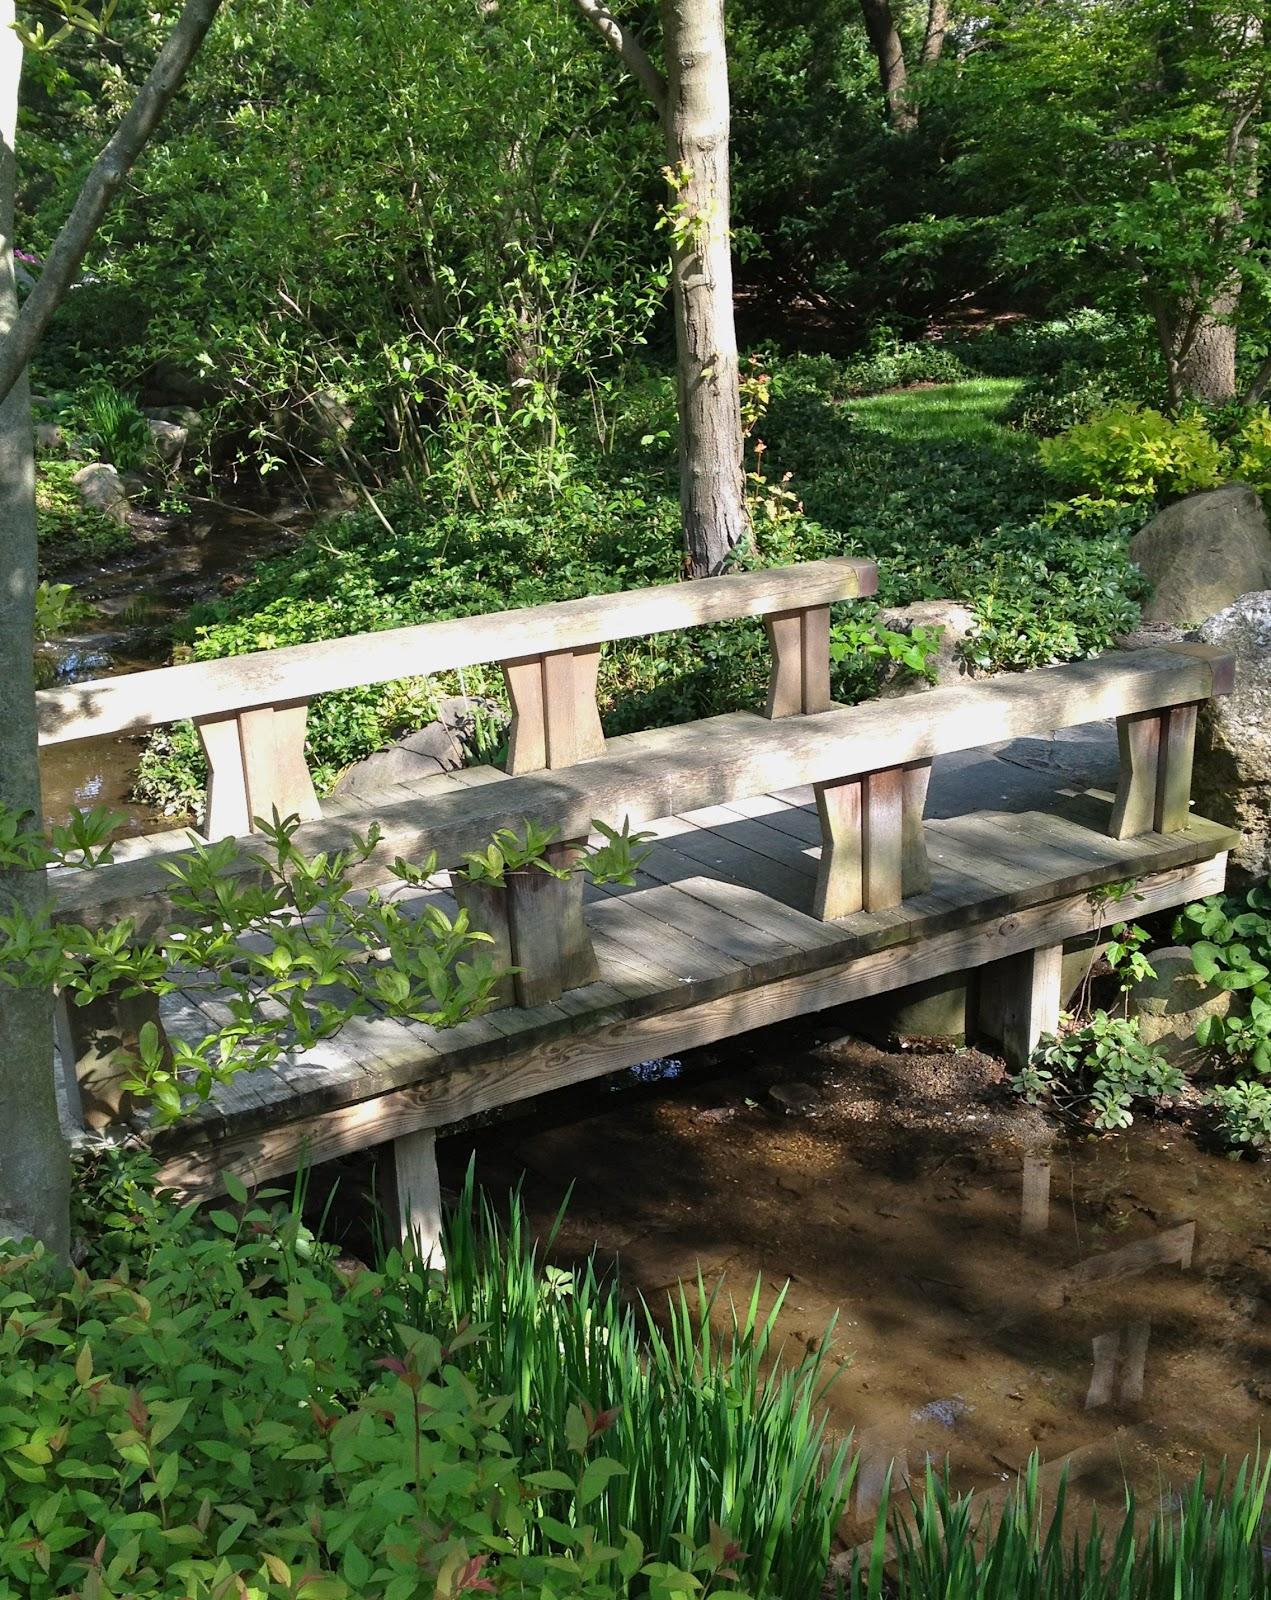 Garden of reflection bridges in japanese gardens for Japanese garden pond bridge